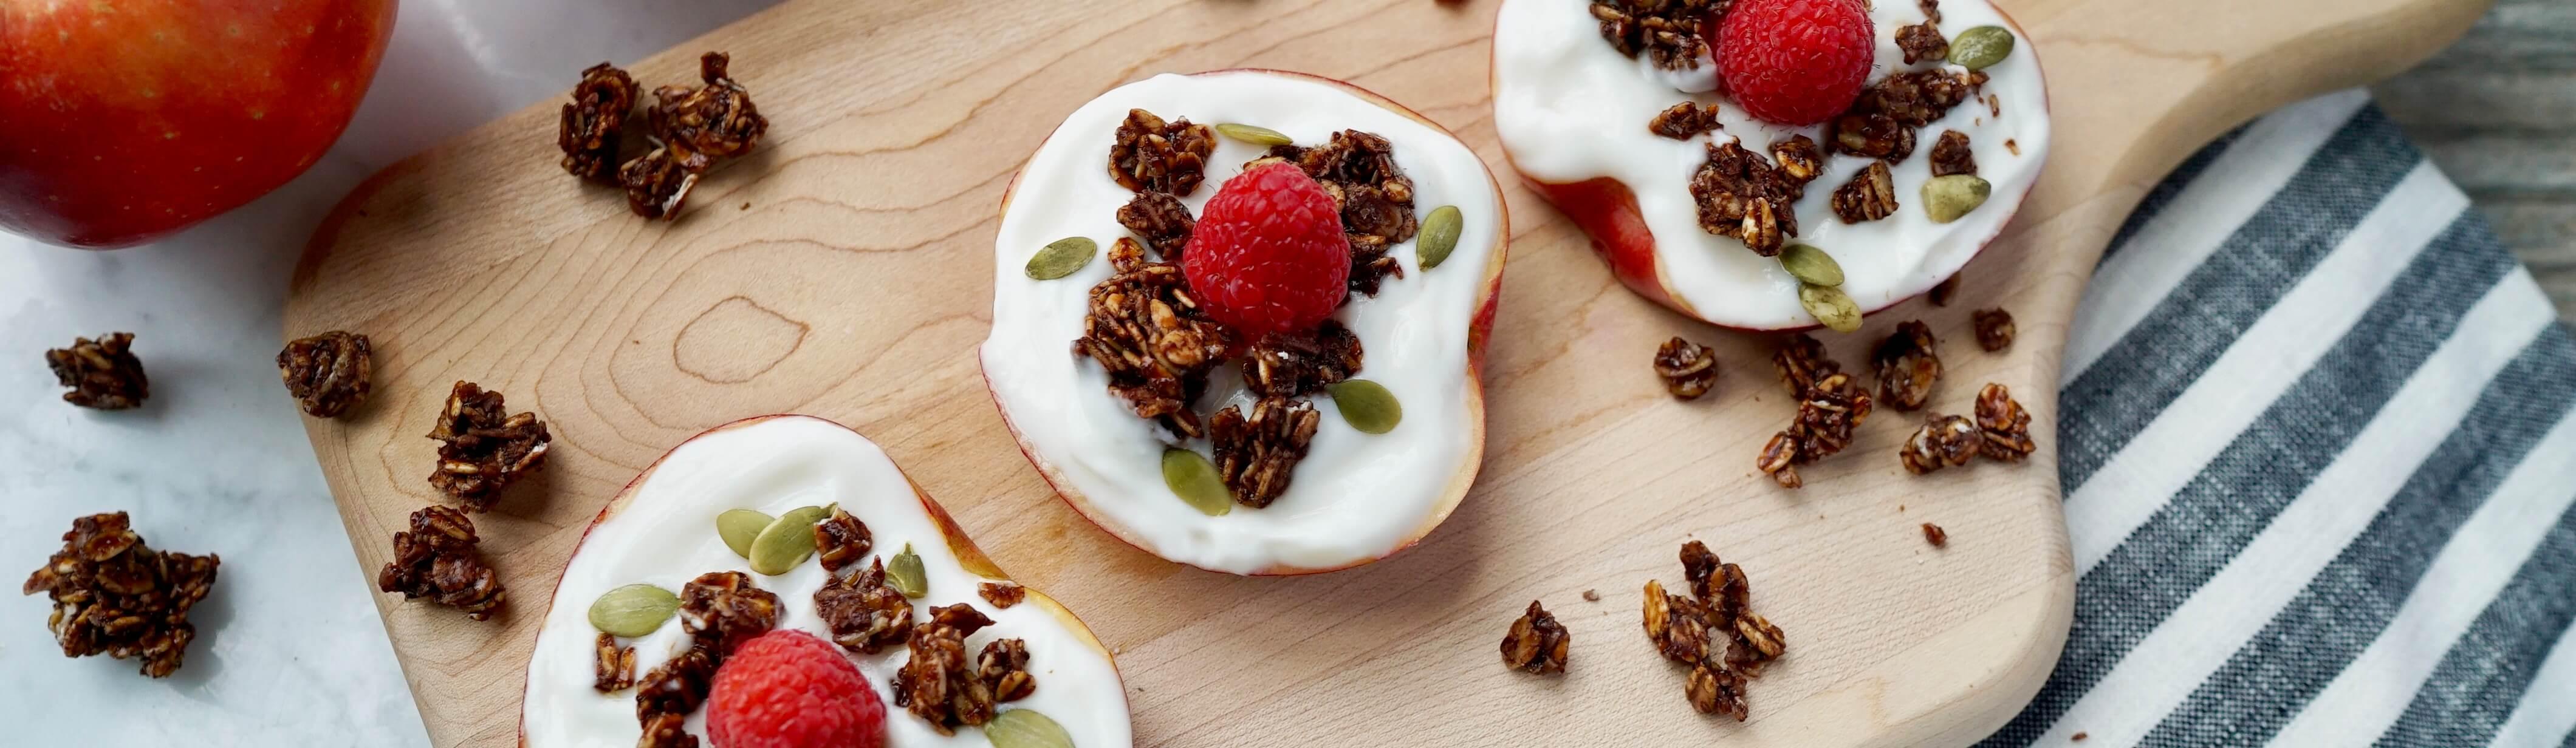 Yogurt and Double Chocolate Granola Apple Cookies